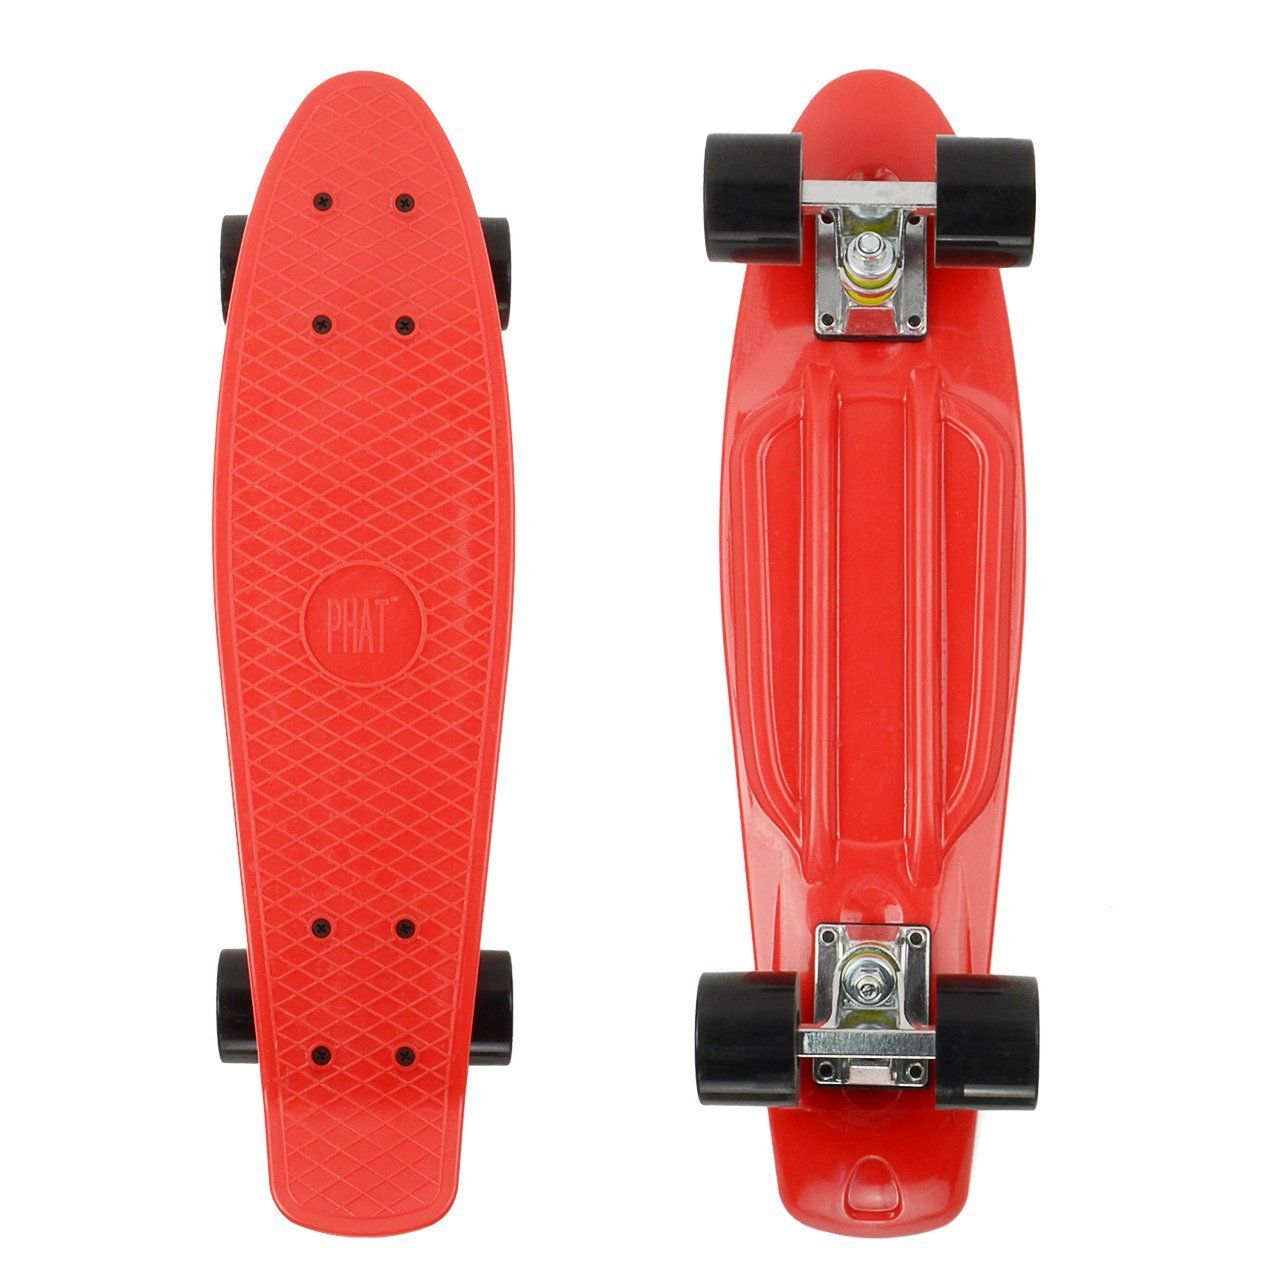 New 22/'/' Retro Street Cruiser Complete Plastic Skateboard with Light Wheels